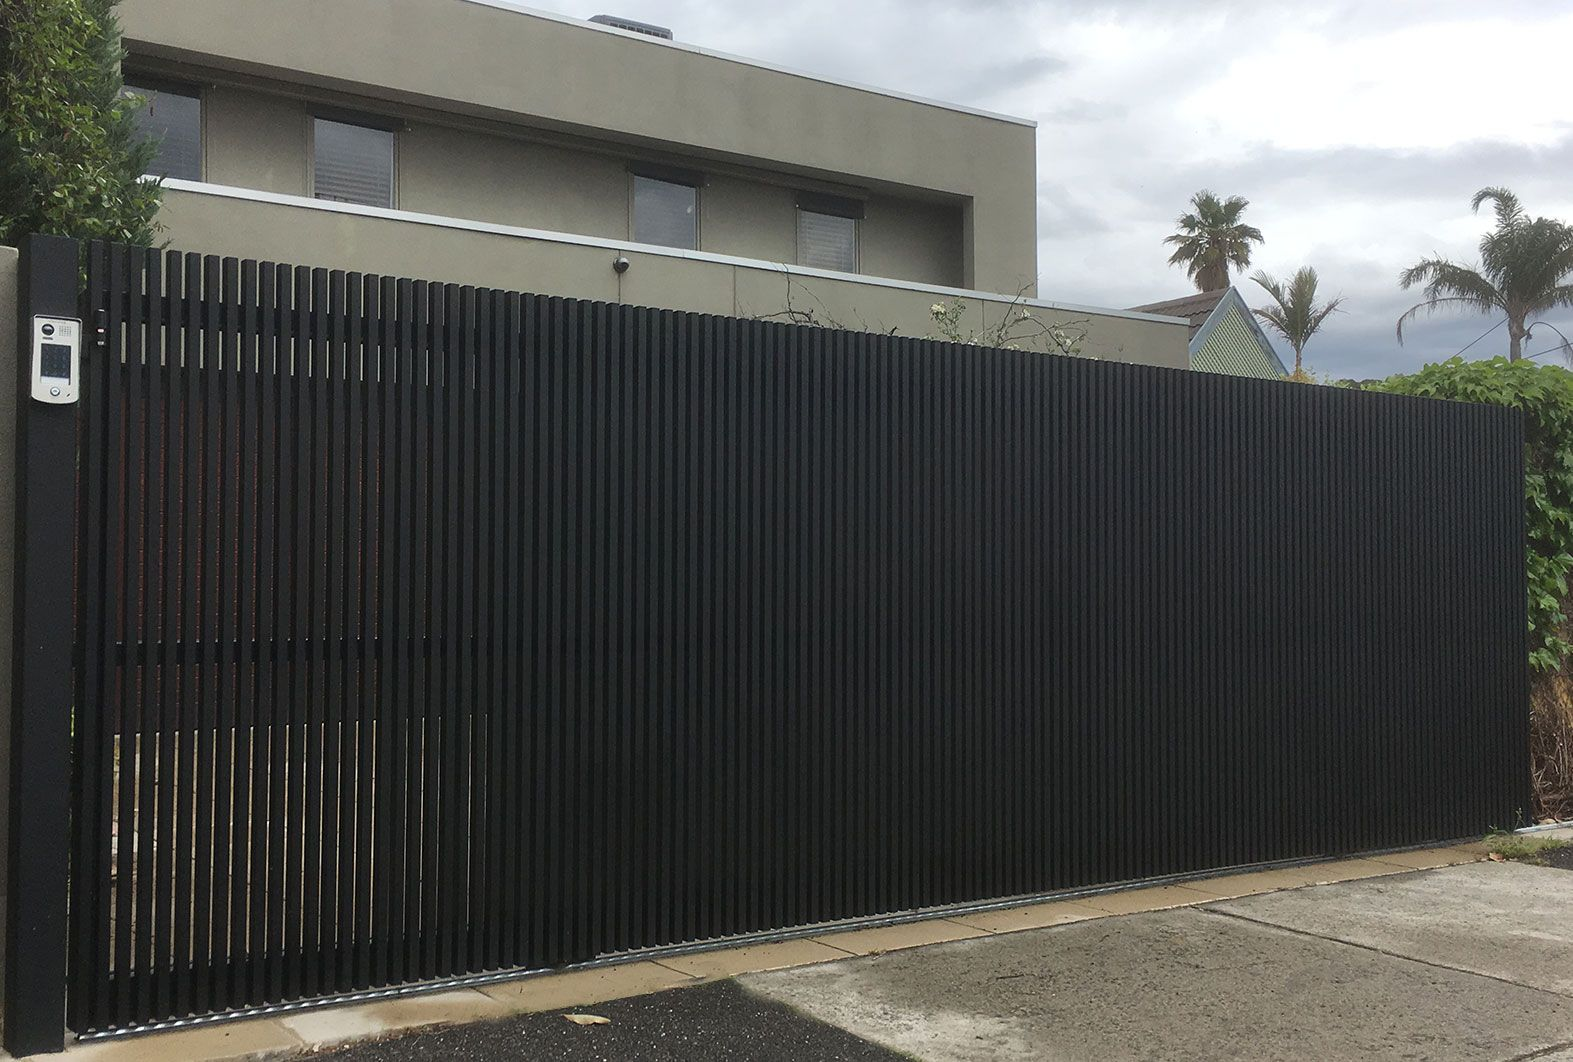 Steel Sliding Gate With Battens Overhang Powdercoated Mannex Black Sliding Gate Electric Sliding Gates Outdoor Gate